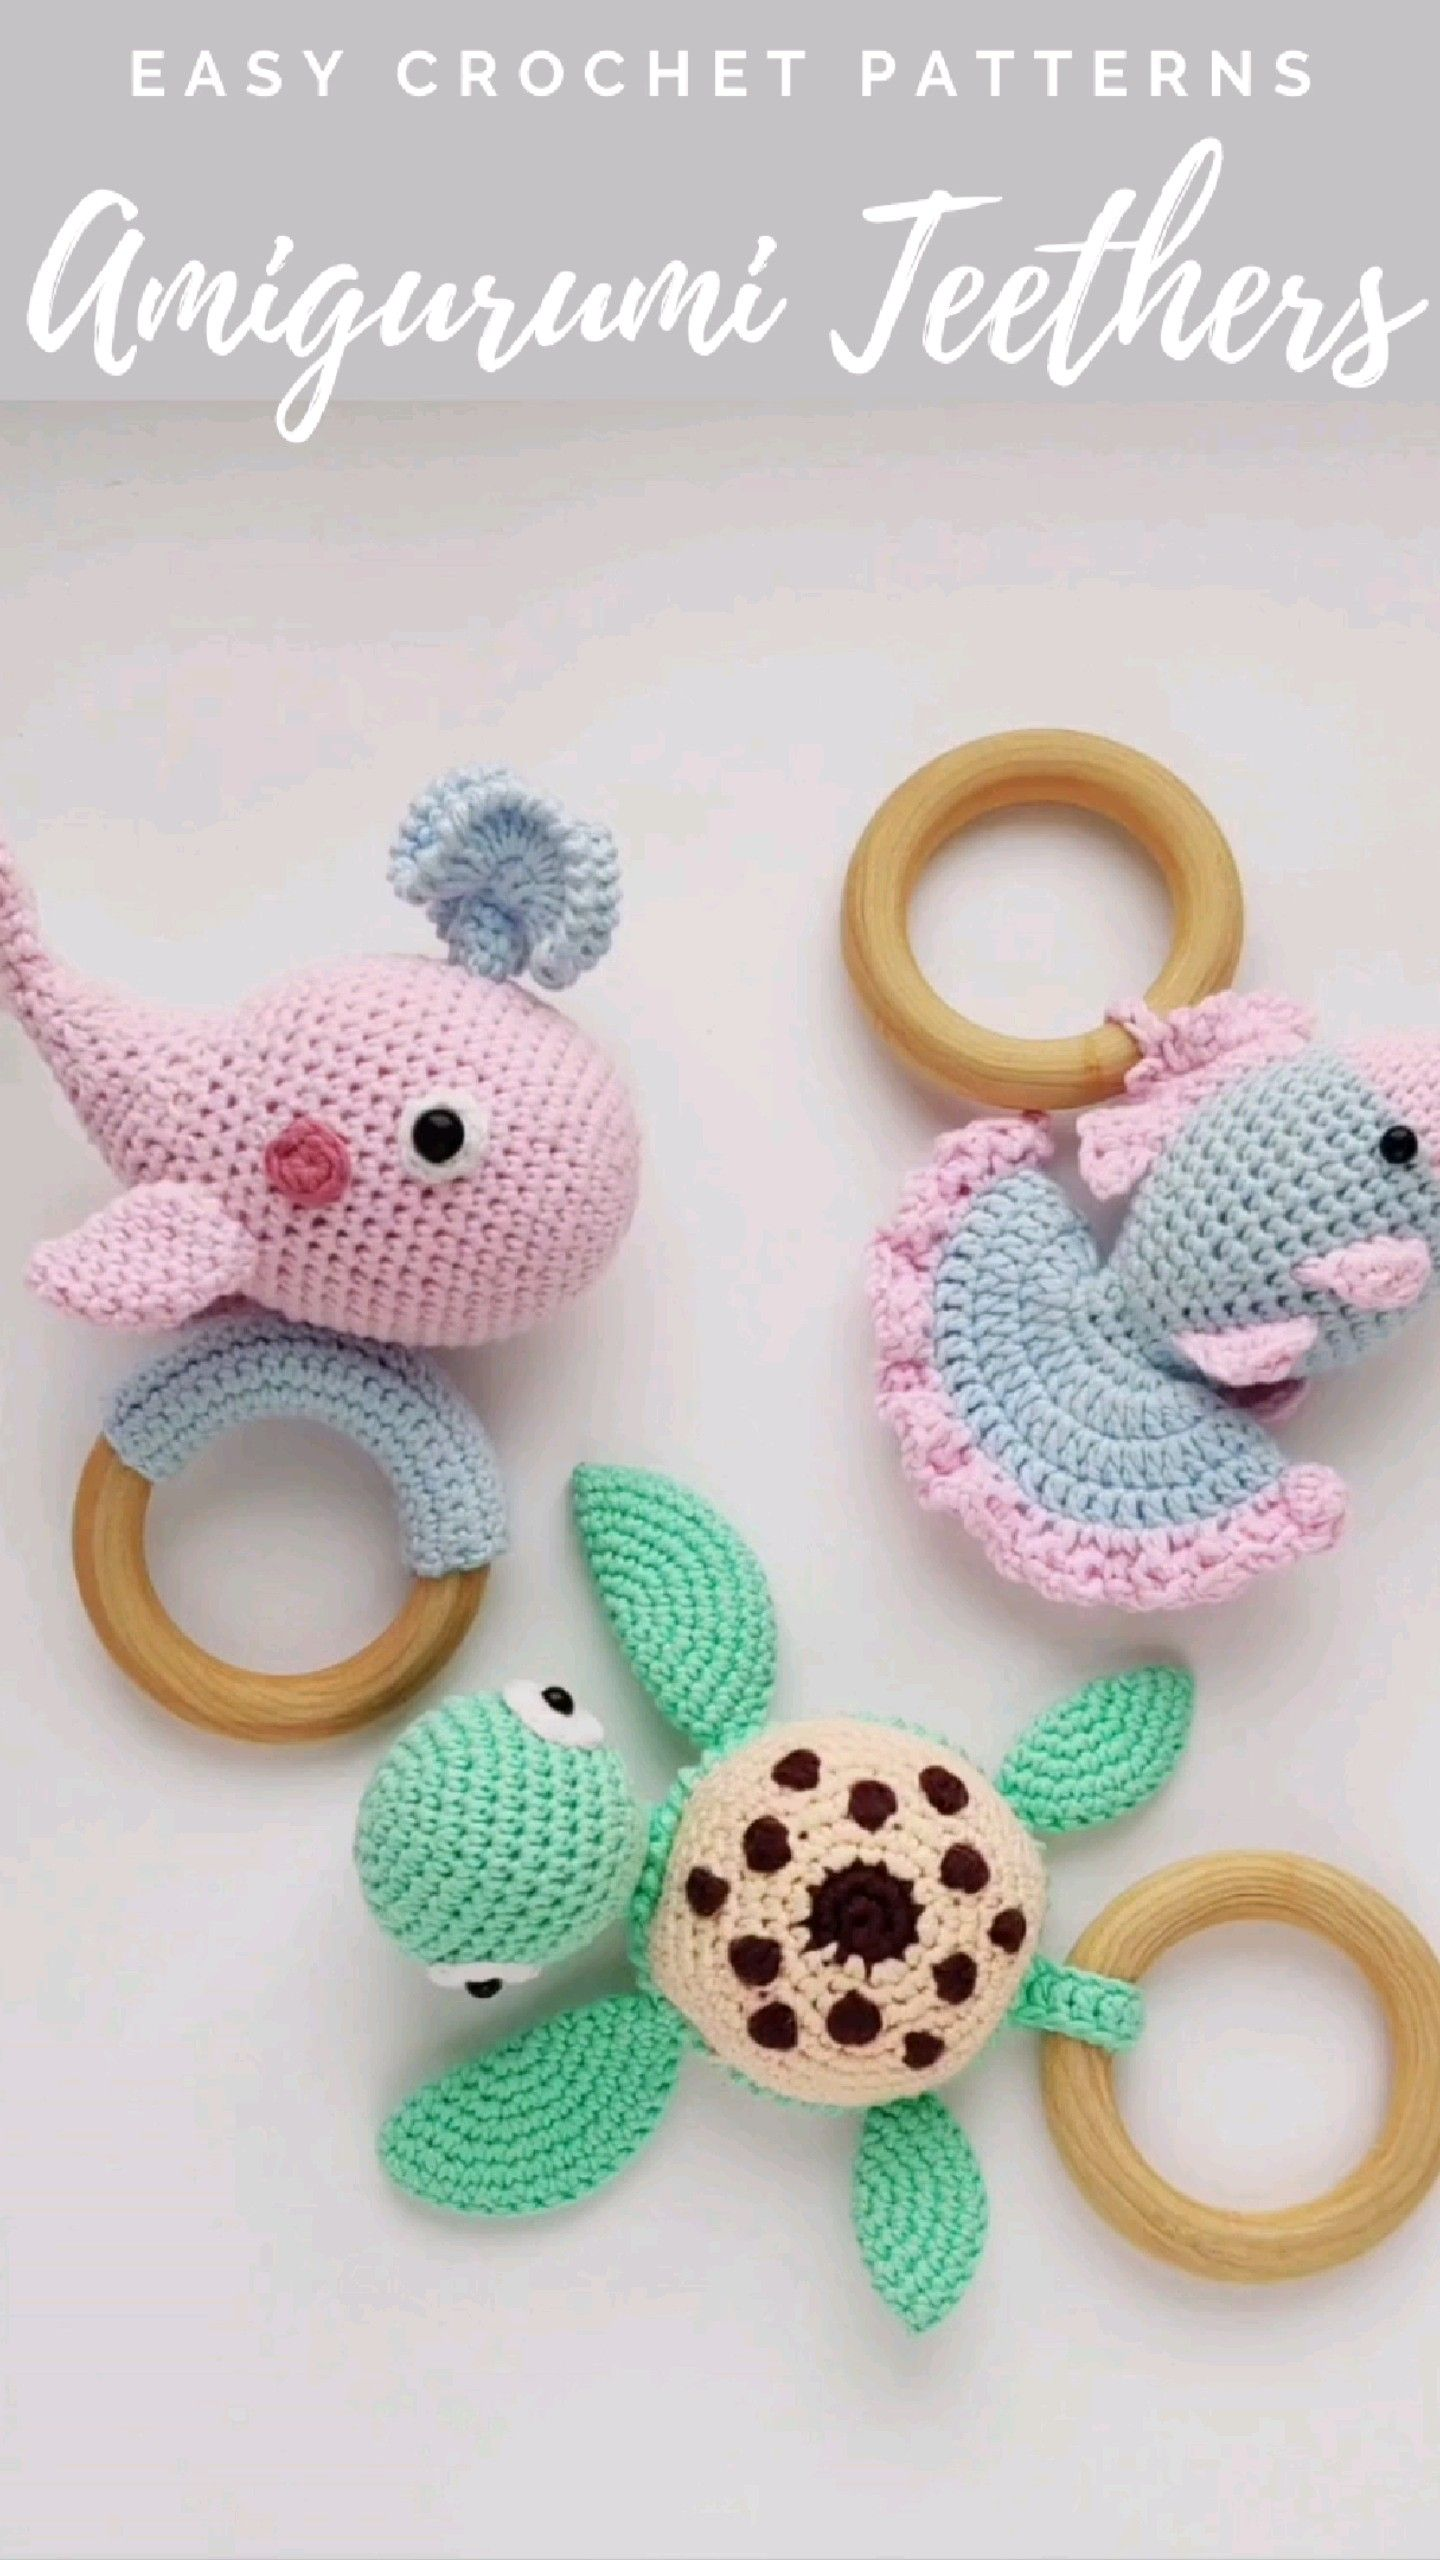 Crochet rattles pattern, Amigurumi toys, Crochet t